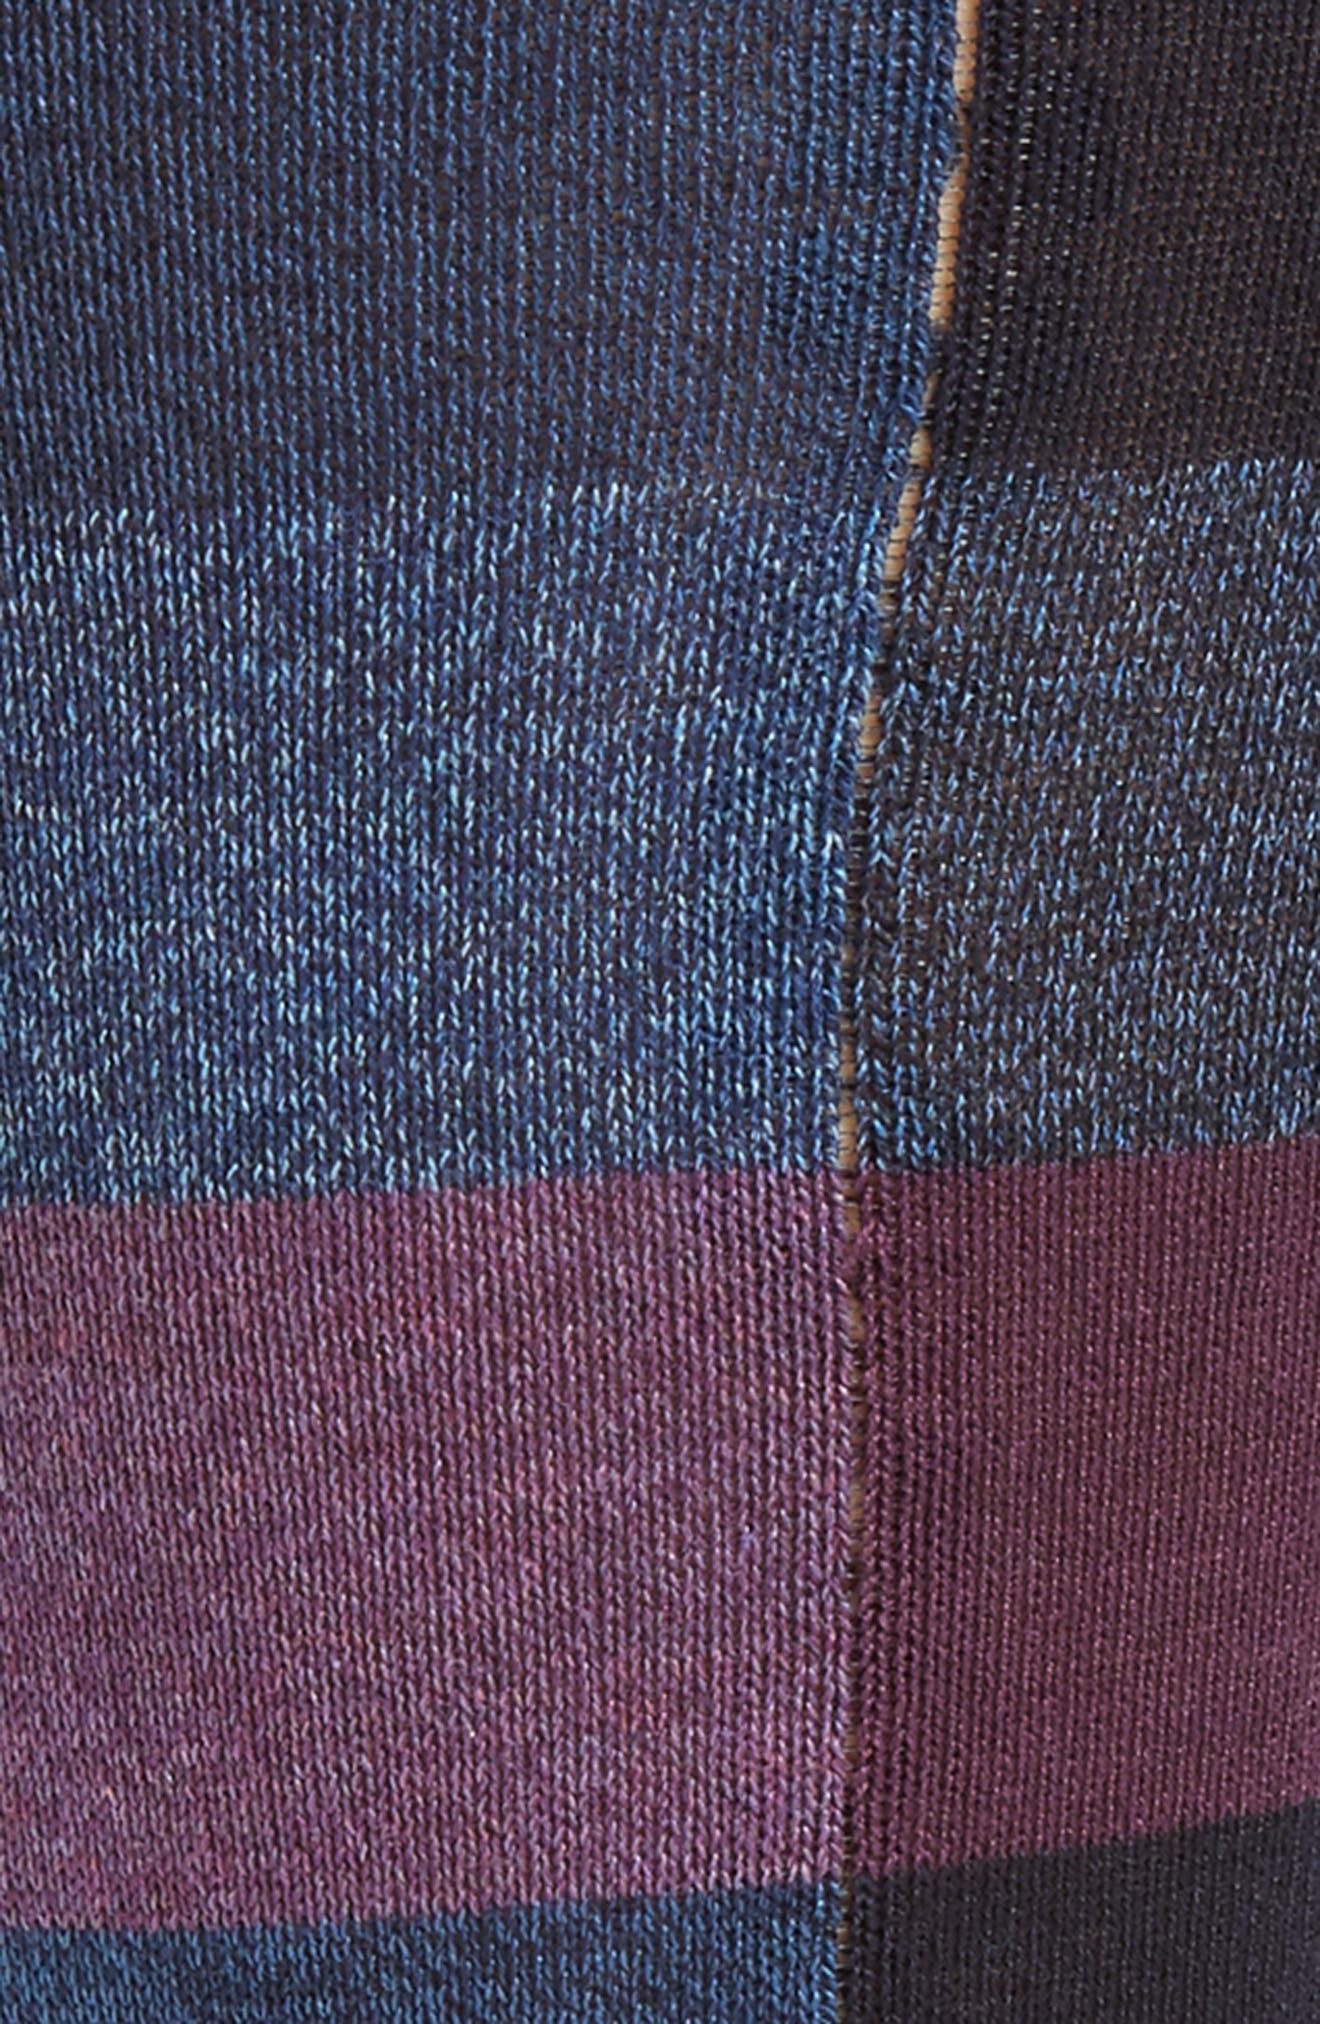 Plaid Crew Socks,                             Alternate thumbnail 2, color,                             408